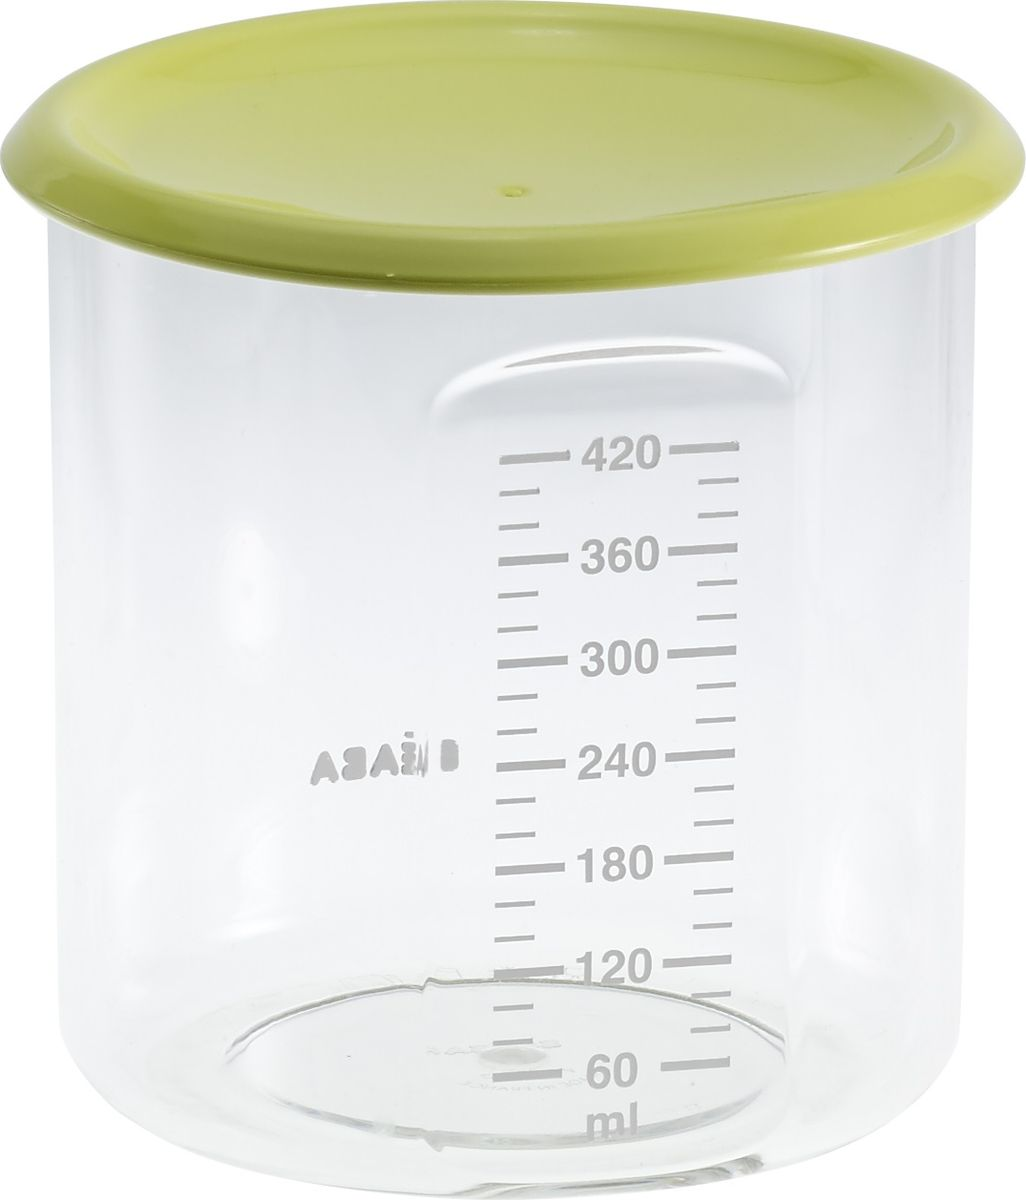 Beaba Контейнер для детского питания Maxi+Portion Tritan Neon 420 мл beaba сушка для бутылок